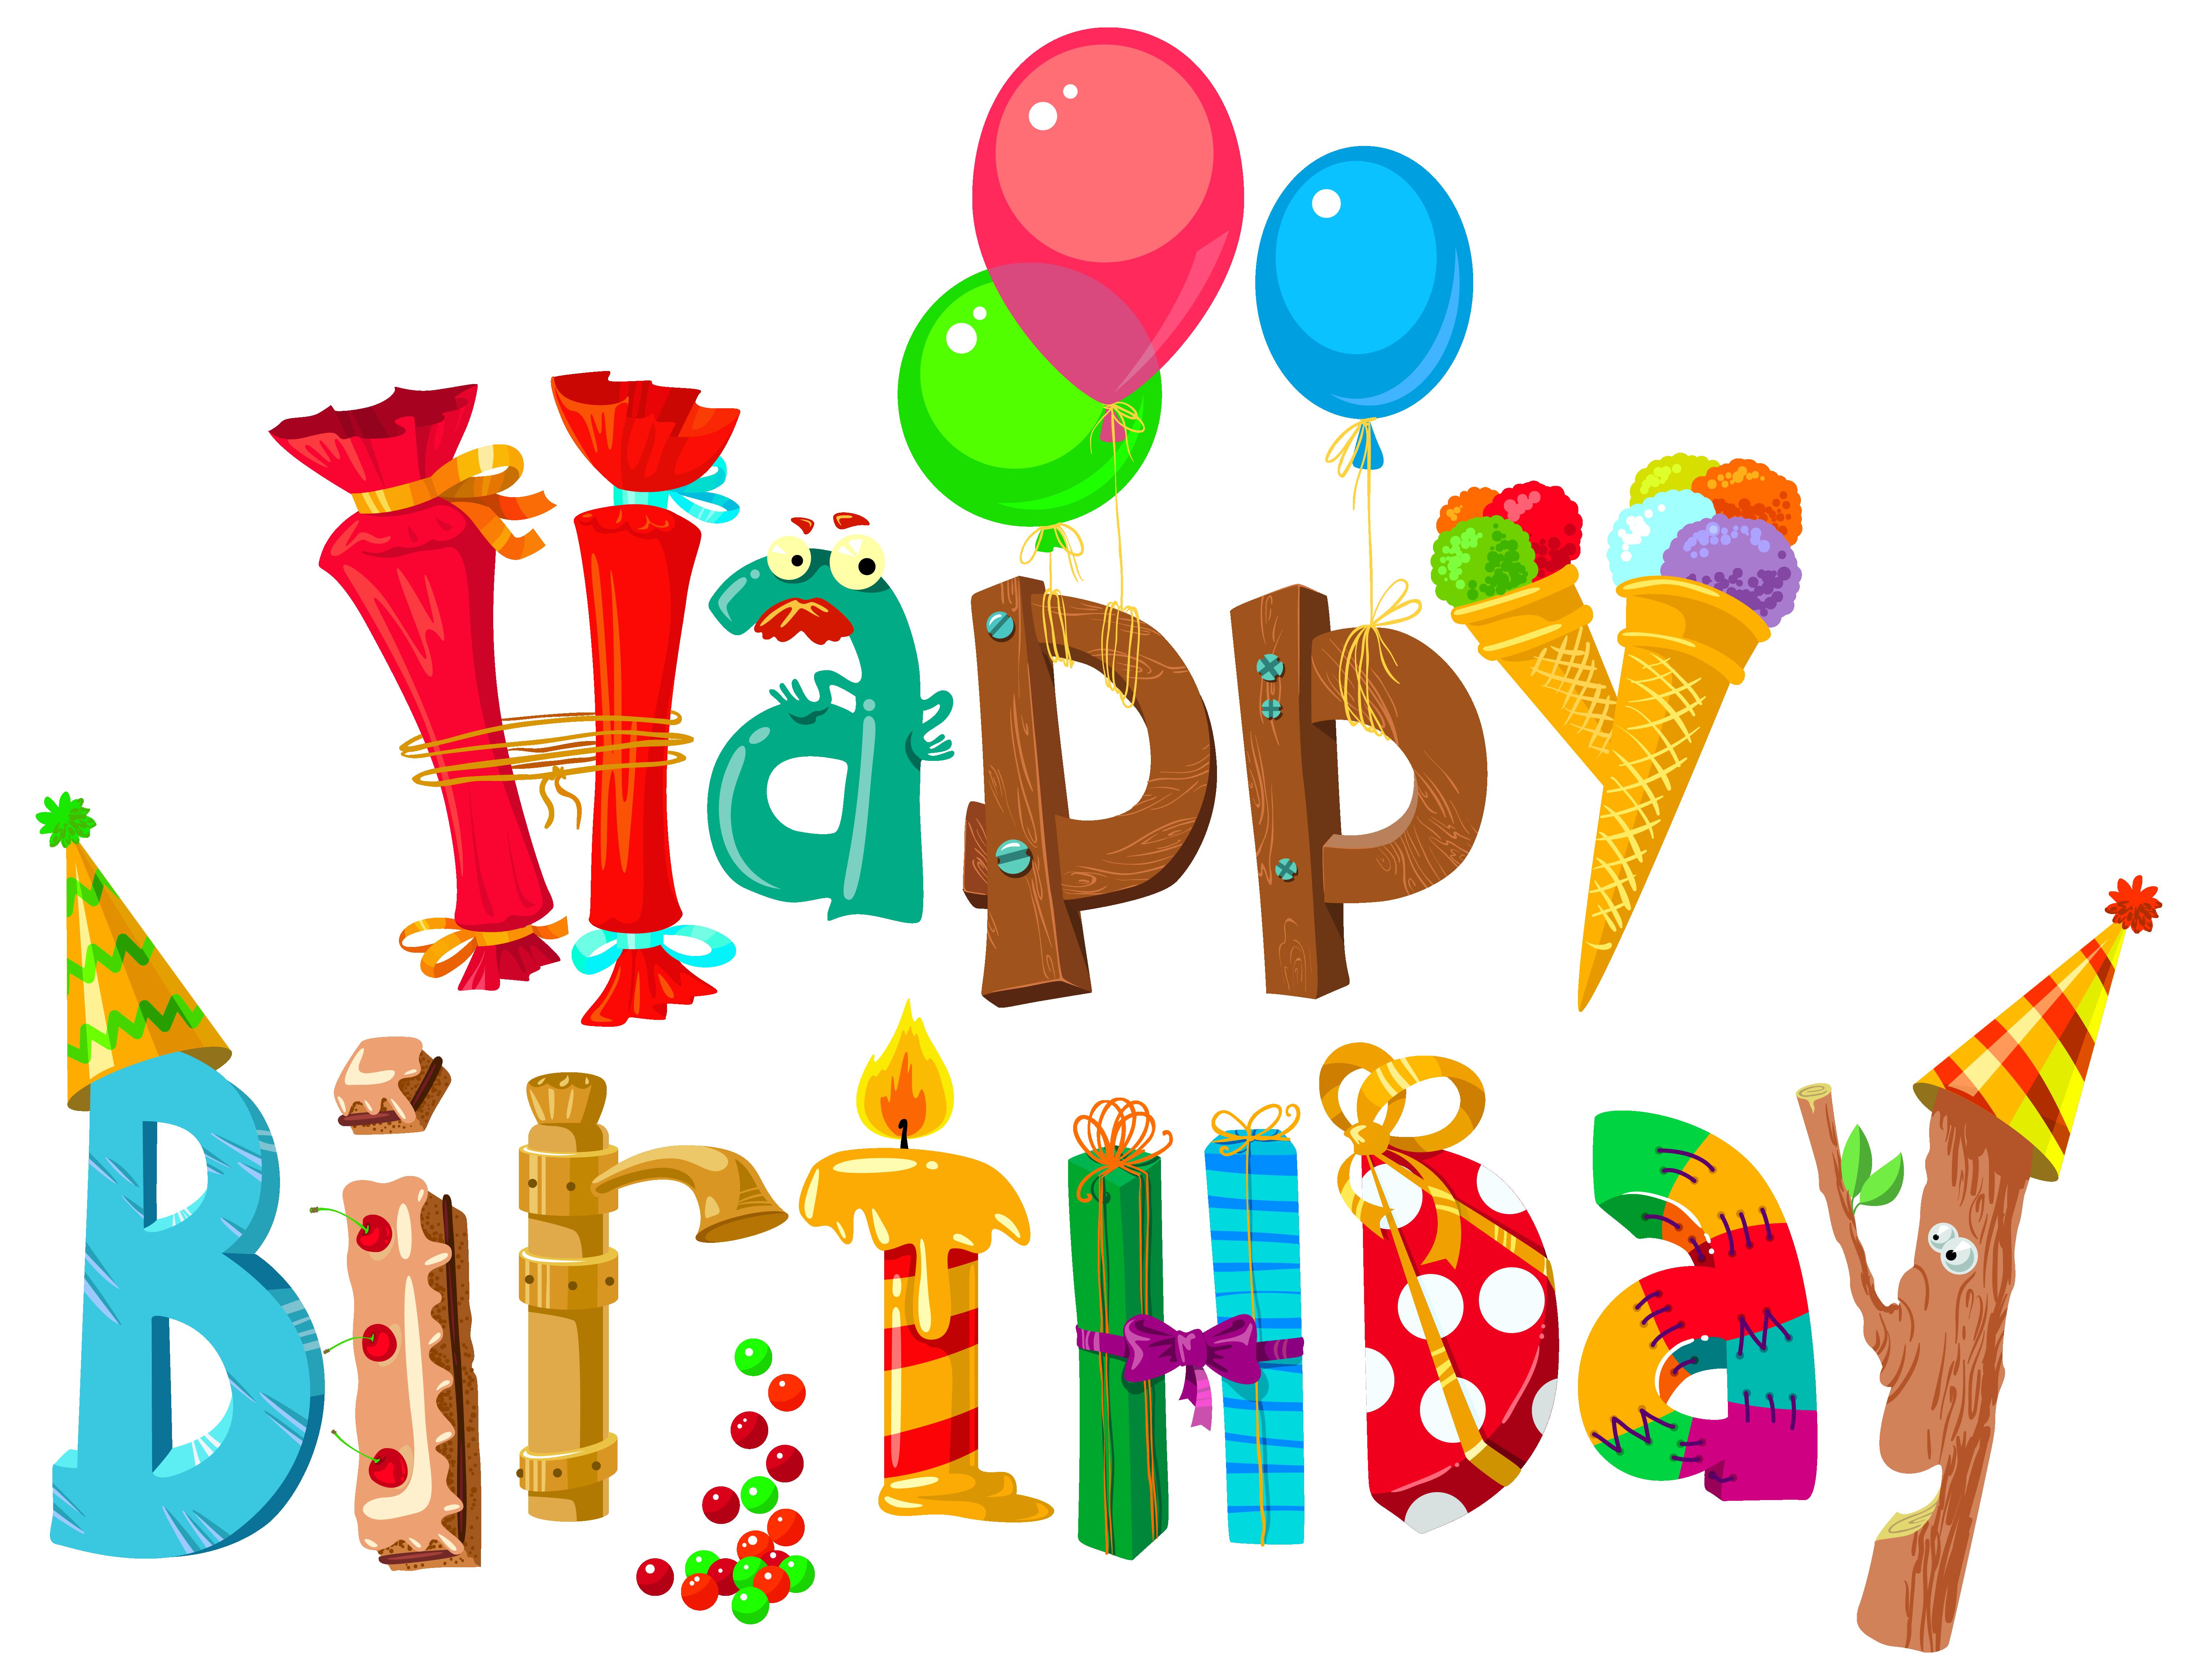 happy birthday clip art .-happy birthday clip art .-1